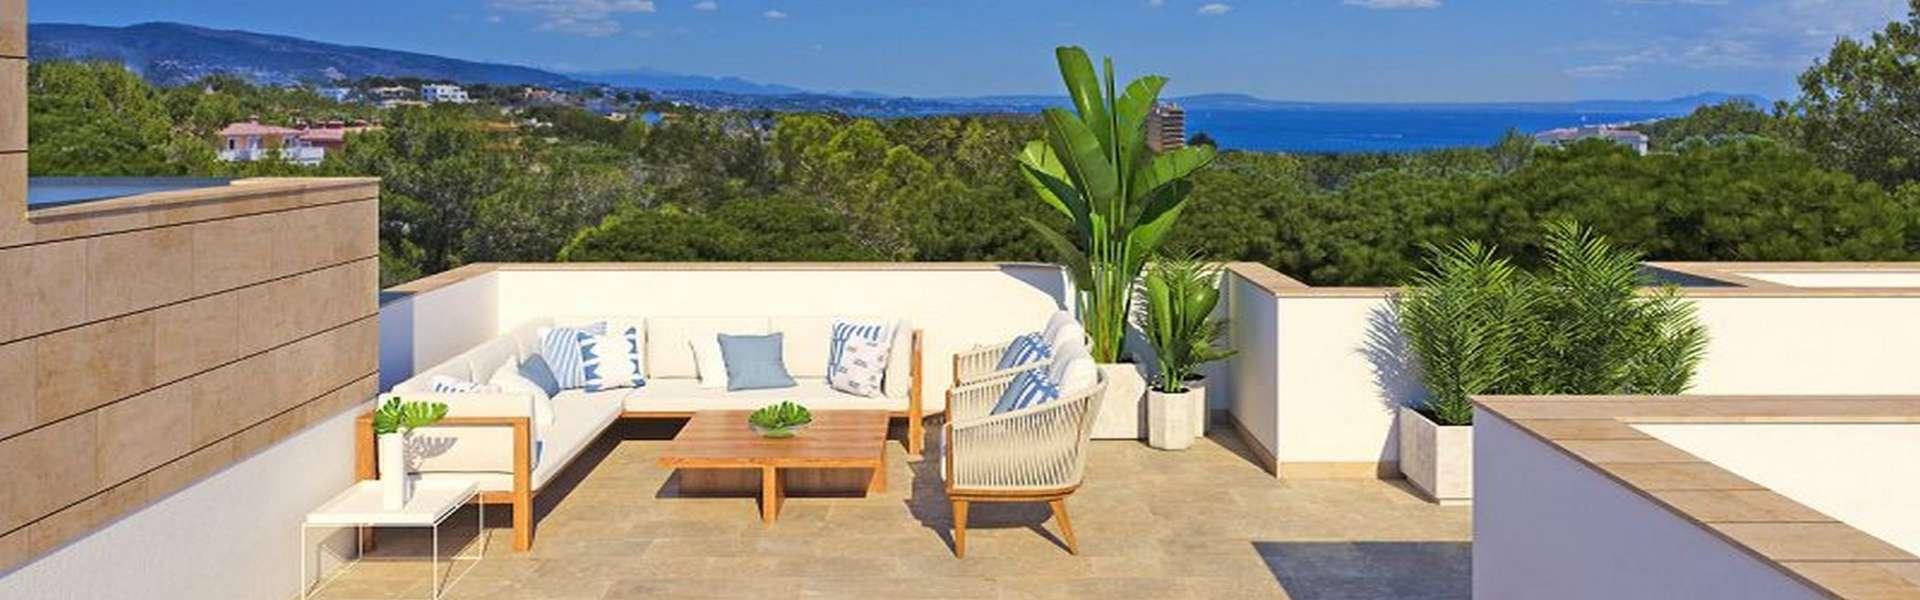 Cala Vinyes - New construction villas with sea view